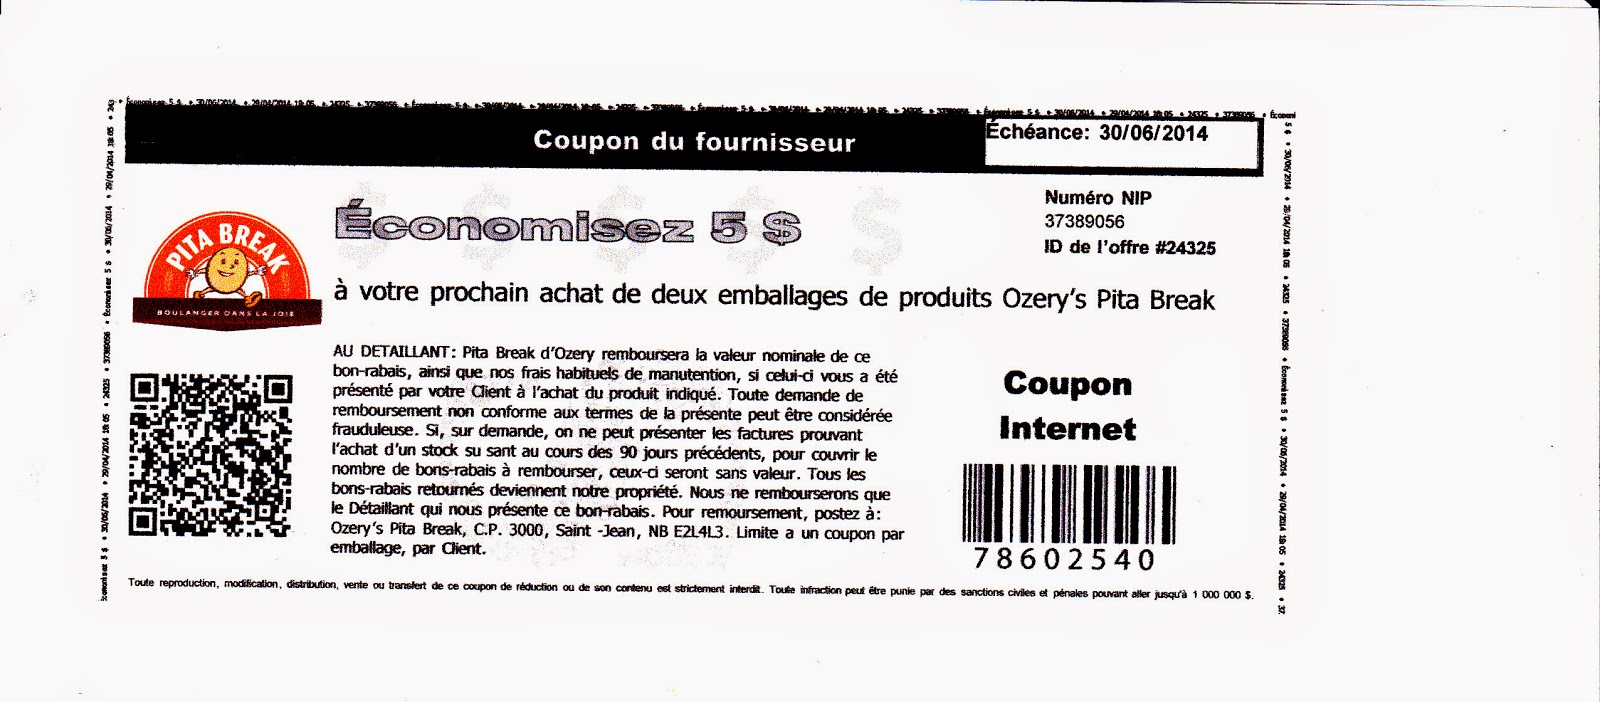 Breakout coupon code